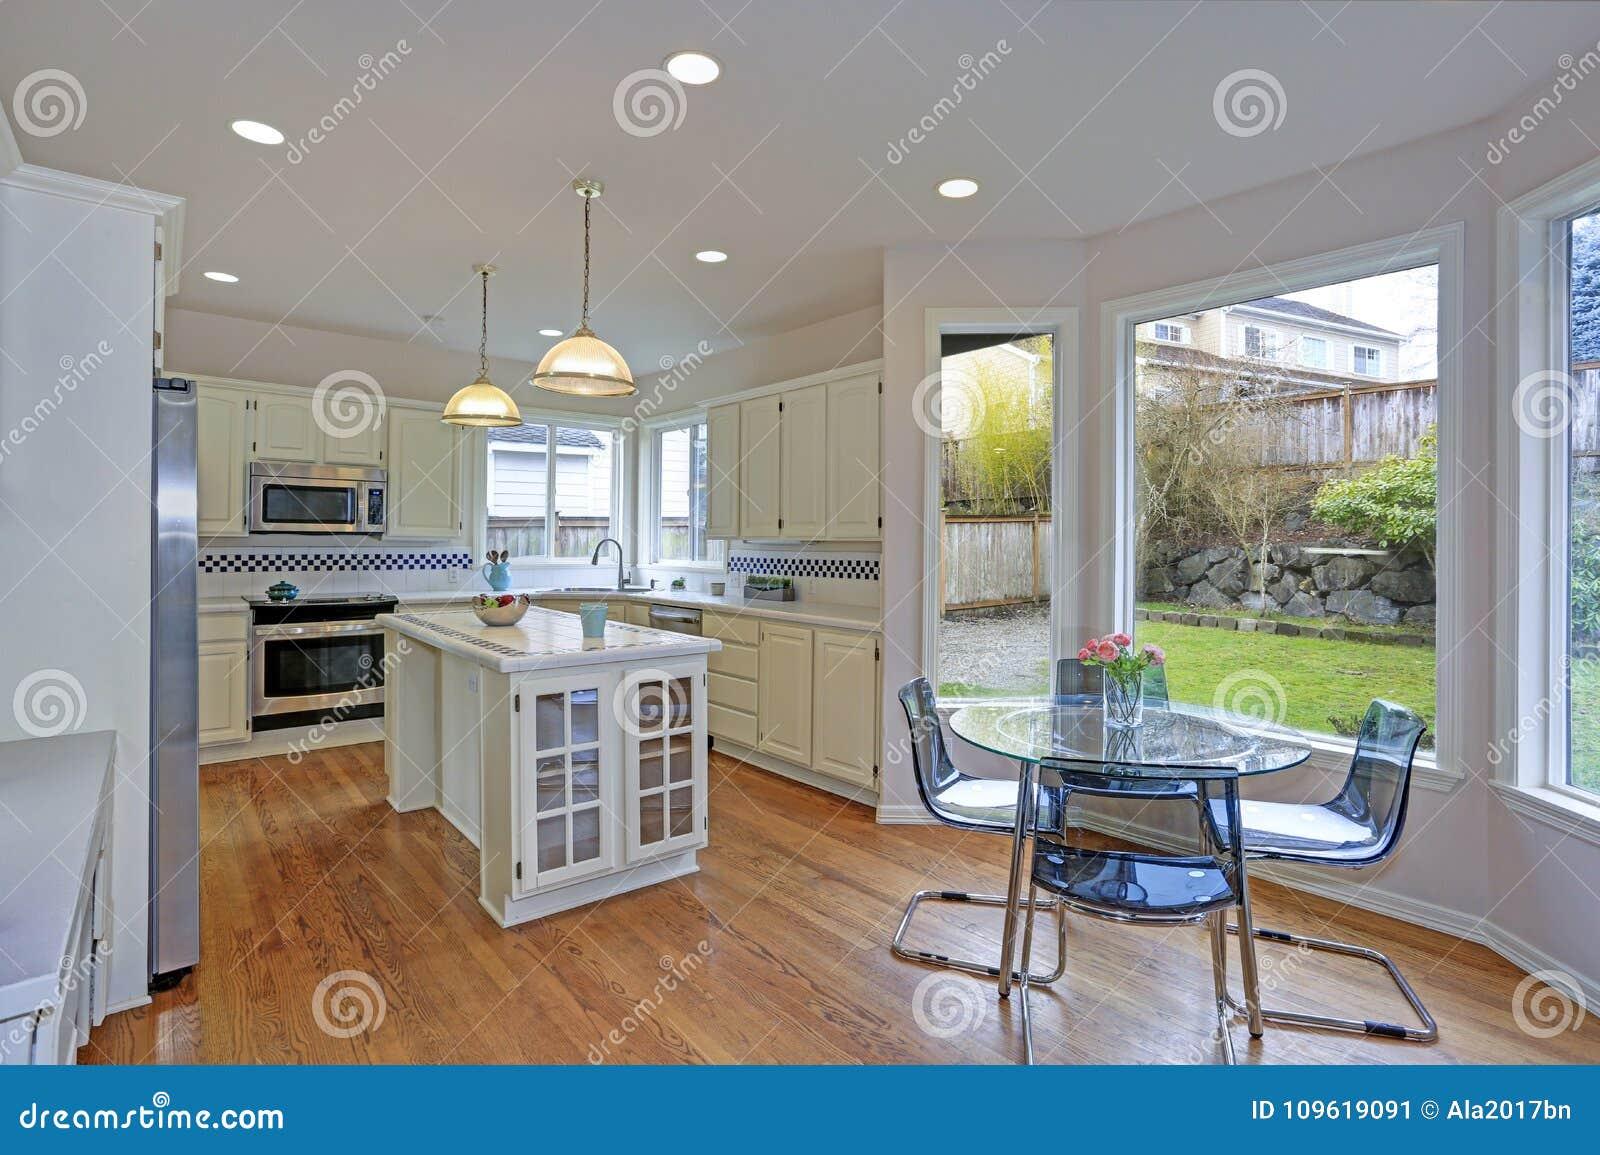 Spacious White Kitchen Interior With Kitchen Island Stock Image Image Of American Apartment 109619091